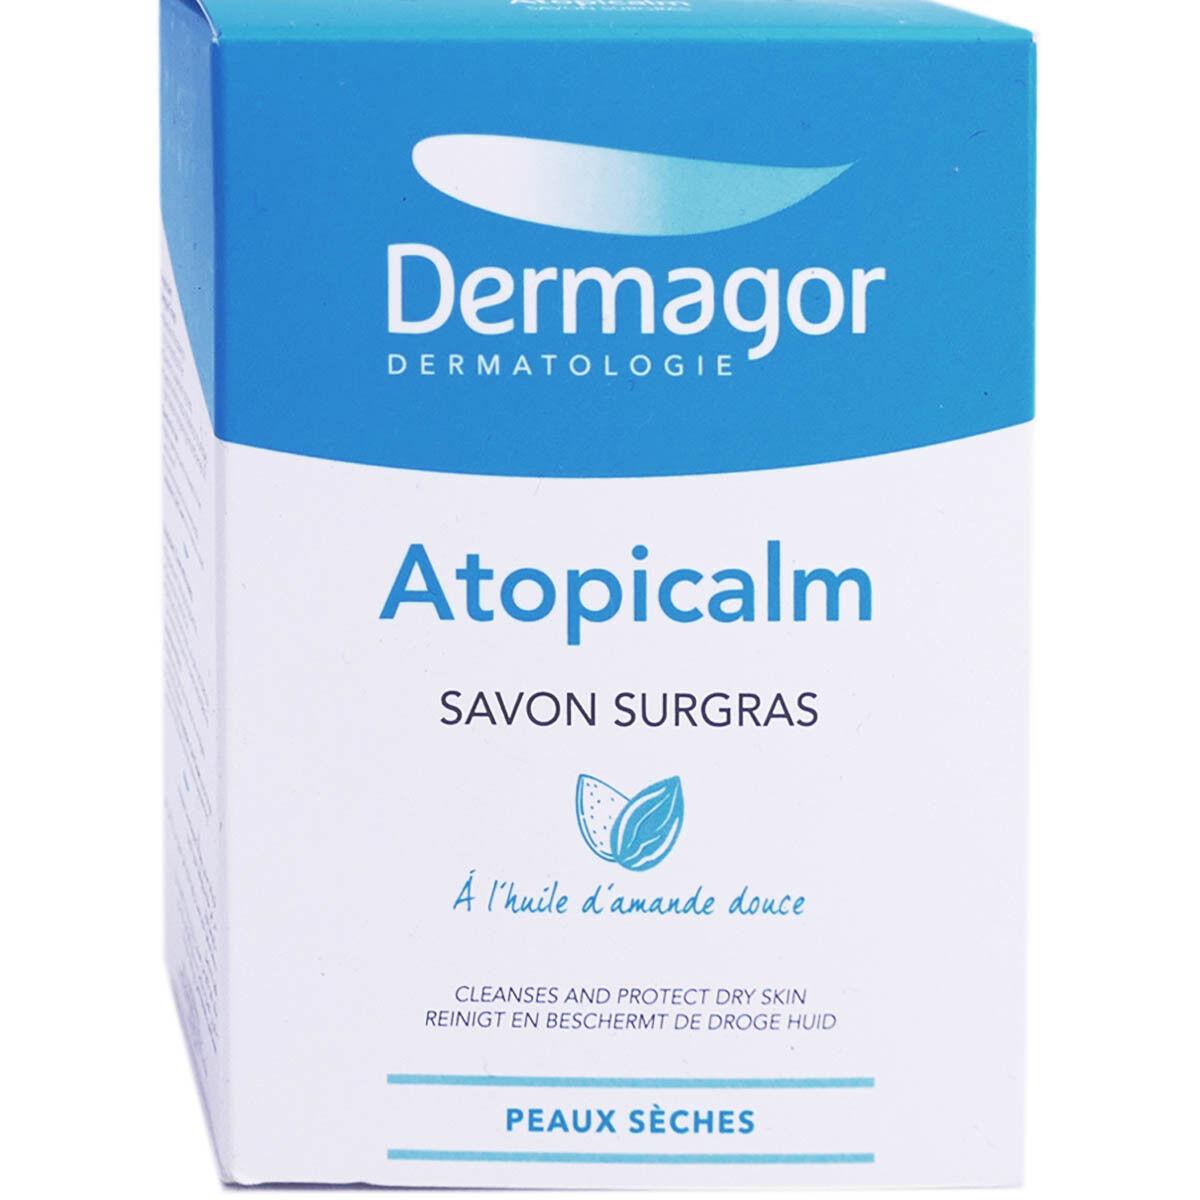 Dermagor atopicalm savon surgras px seches 150g